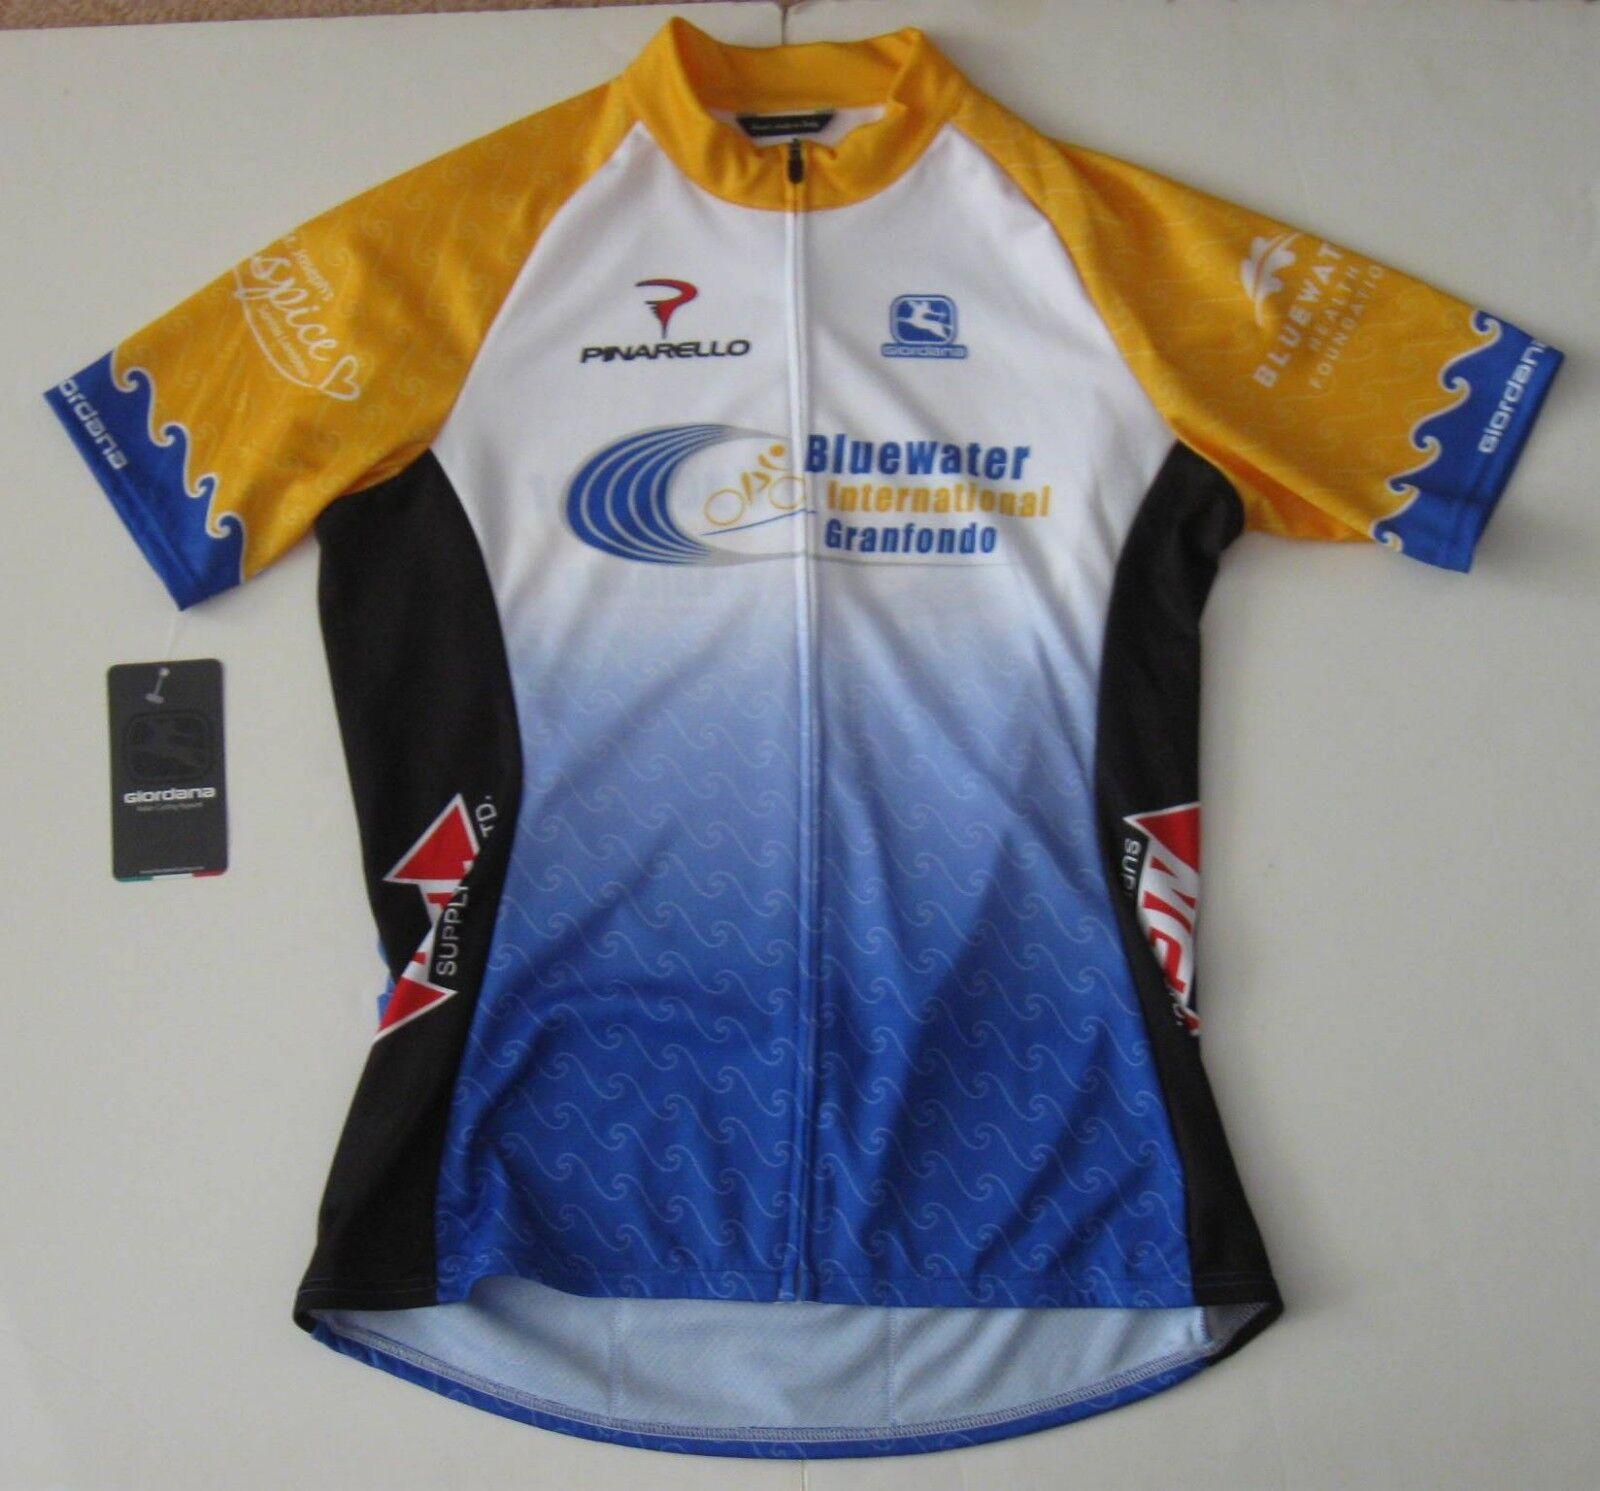 XL Damens Giordana Full Zip Vero Cycling Blauwater Jersey Blauwater Cycling Polyester new NWT 90ff21